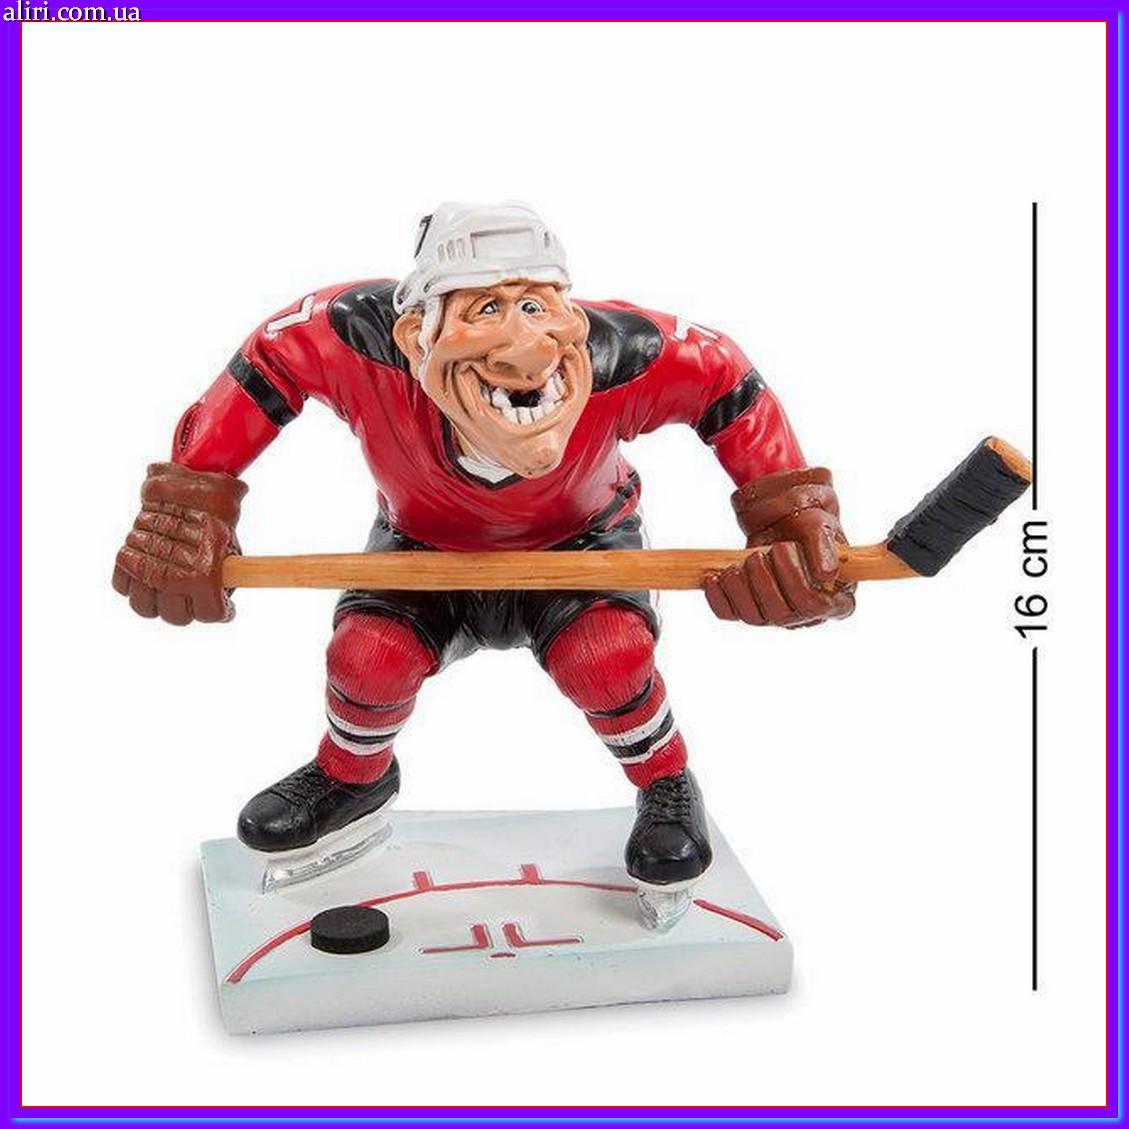 Статуэтка Хоккеист Stratford супер подарок